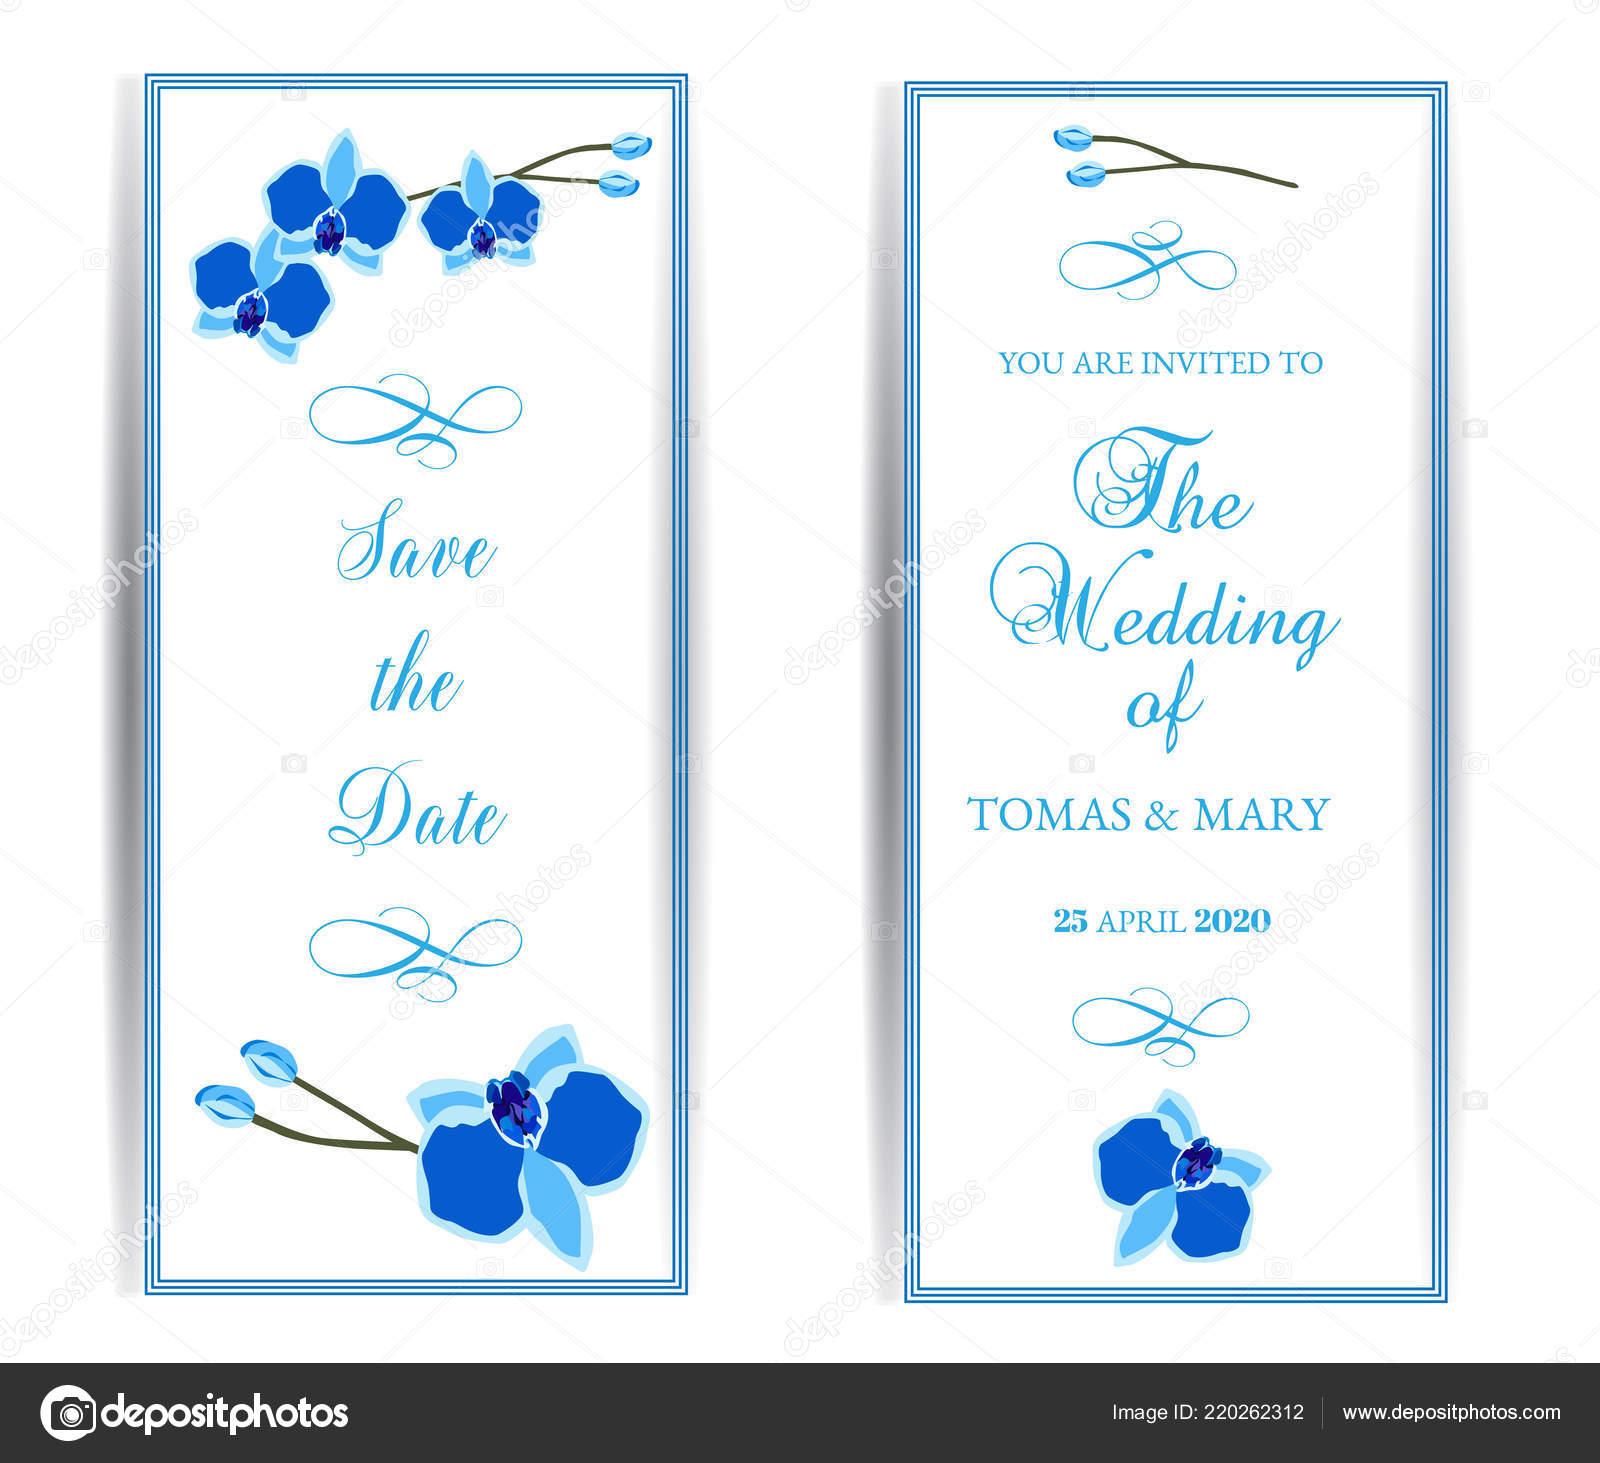 Plantilla Invitación Evento Matrimonio Con Orquídea Azul